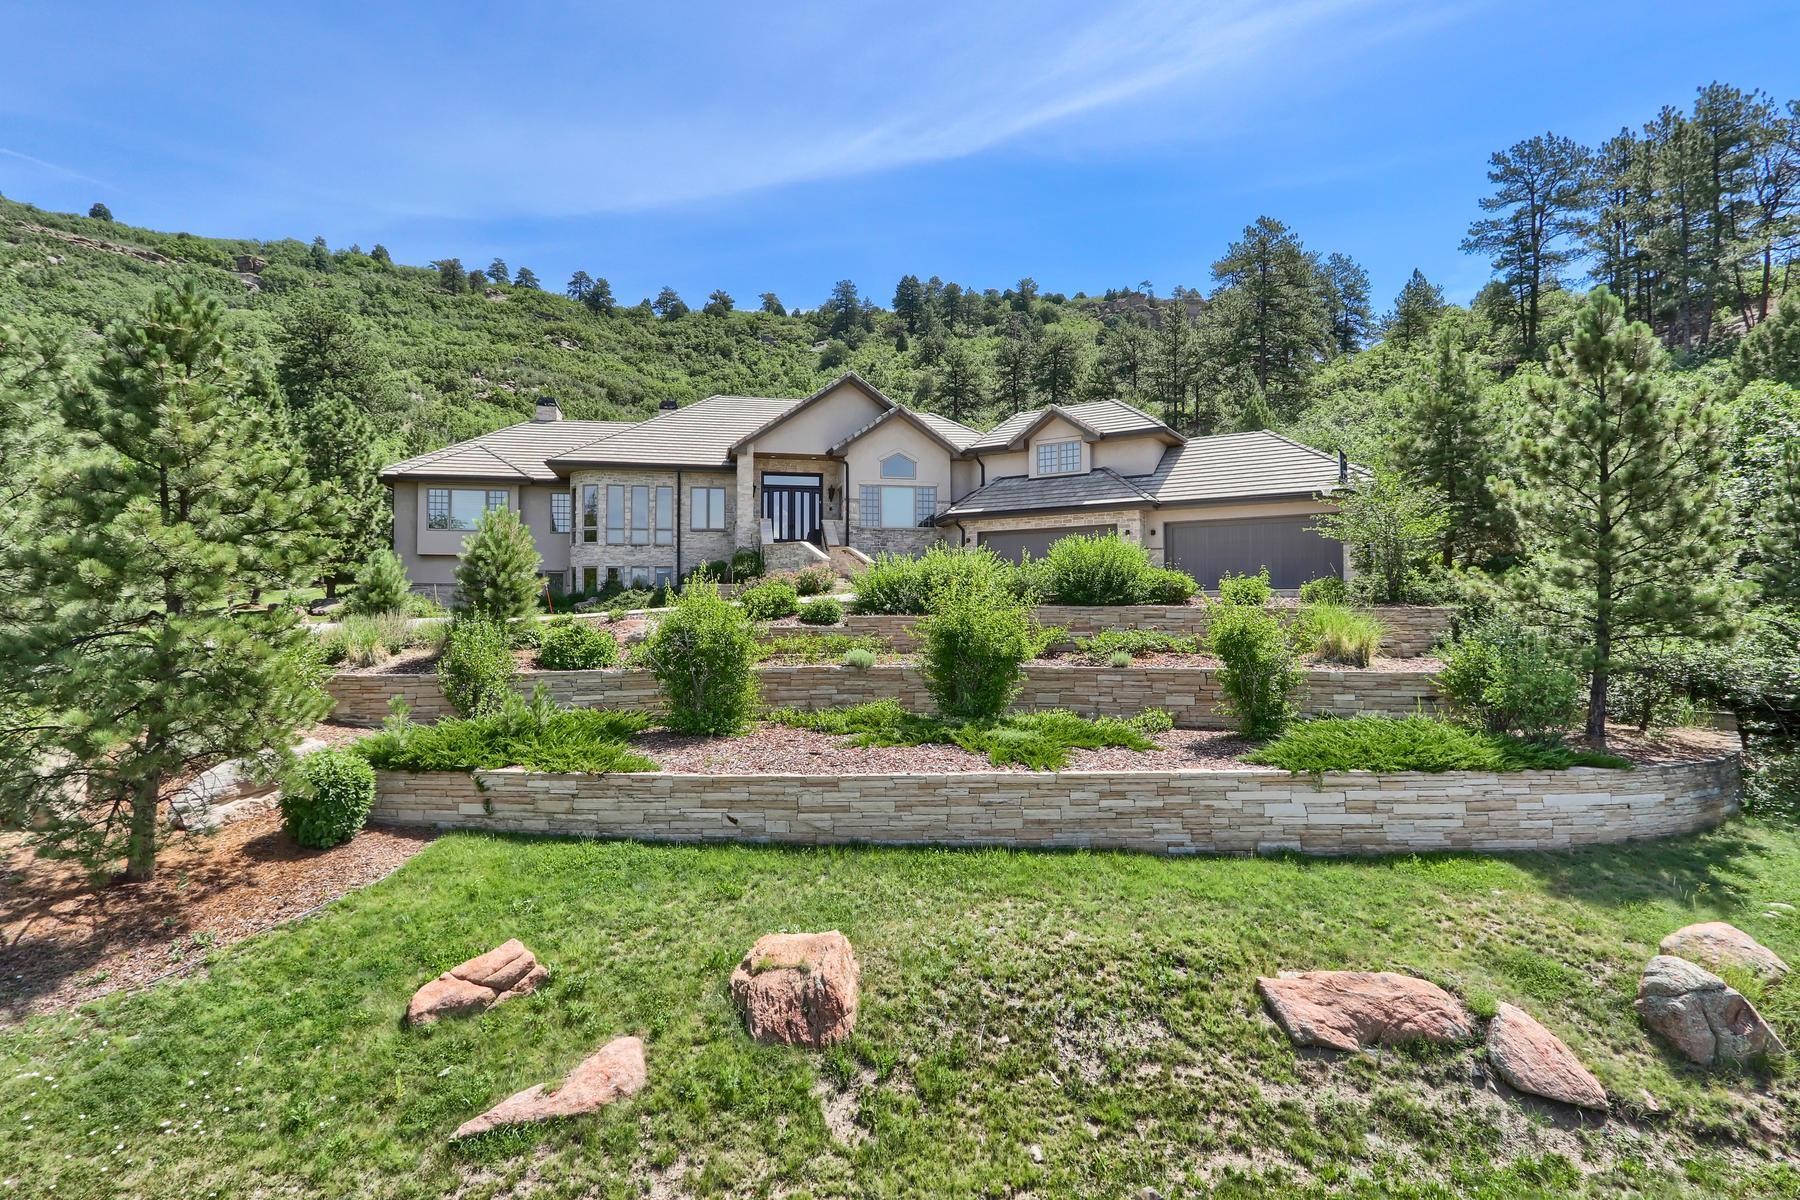 Single Family Homes for Sale at 1023 Anaconda Drive Castle Rock, Colorado 80108 United States